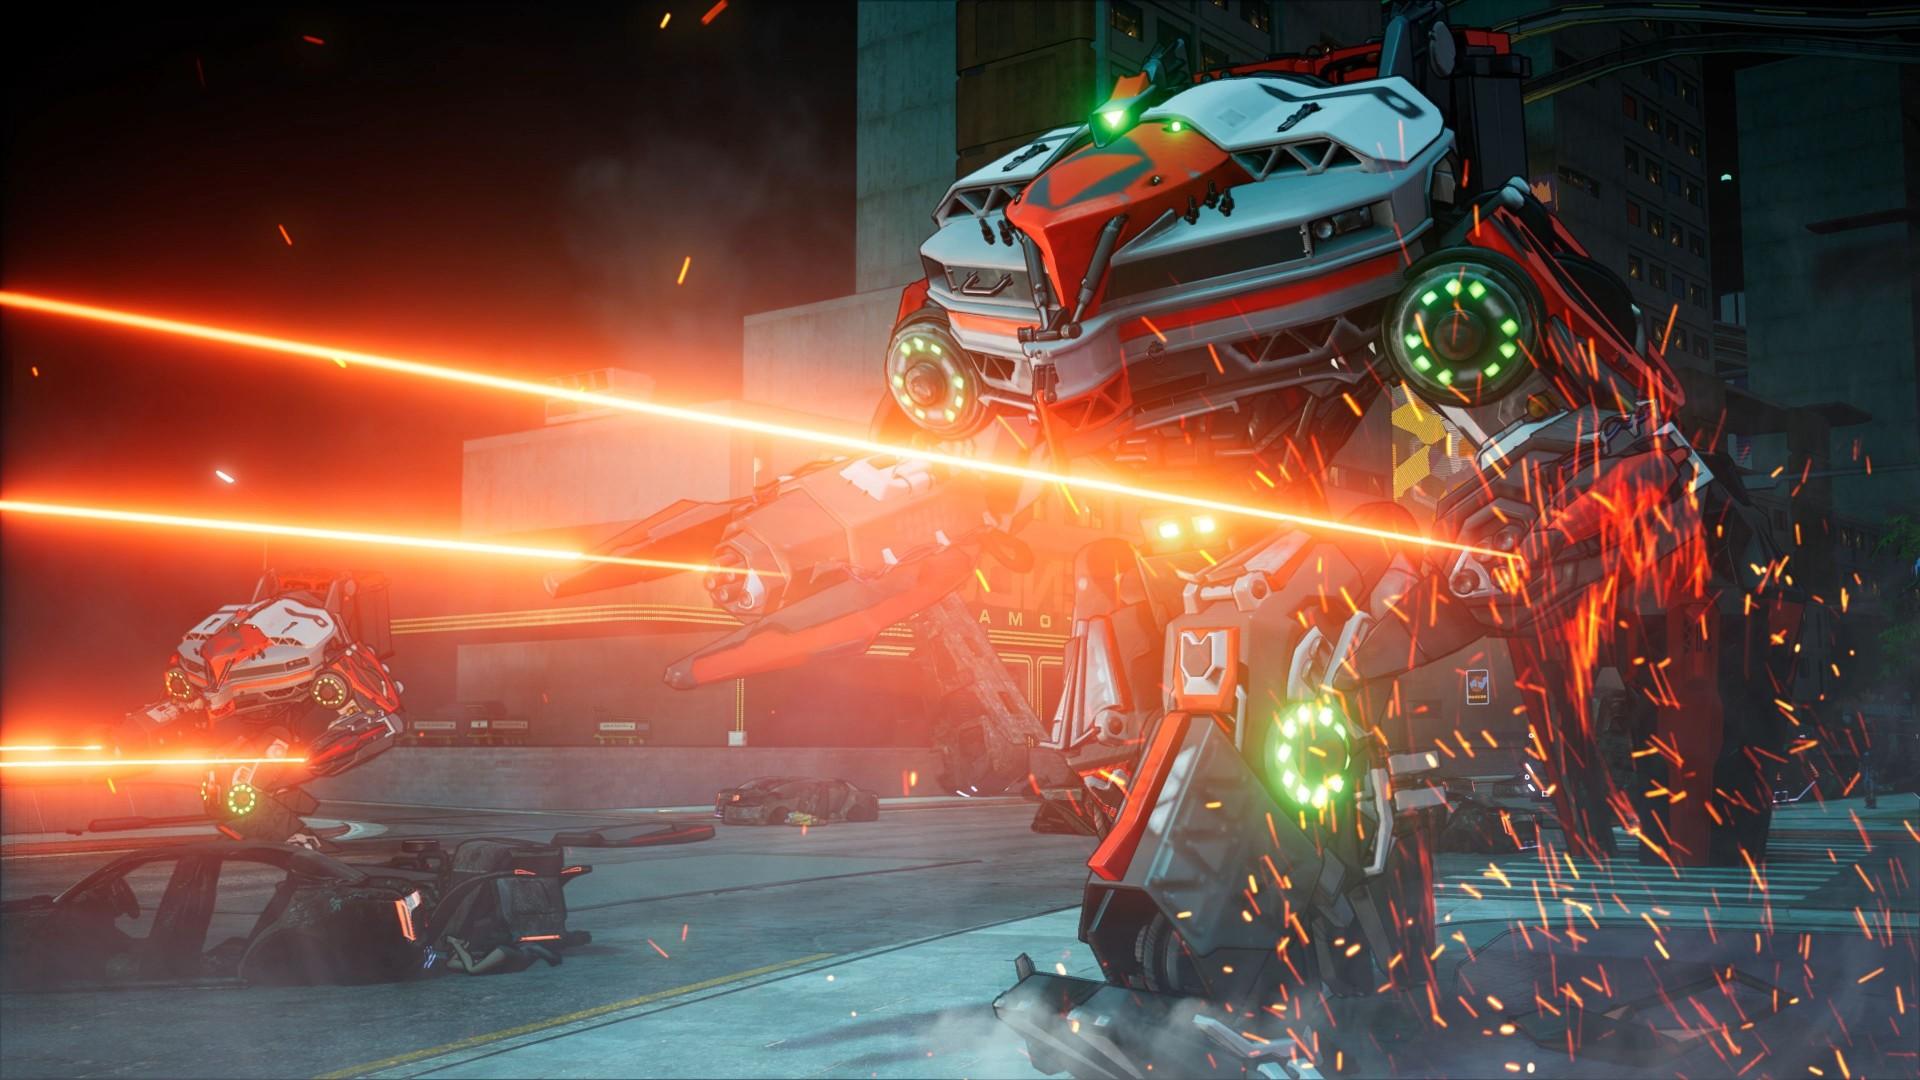 Wallpaper Crackdown 3 4k Hd E3 2017 Games 13863